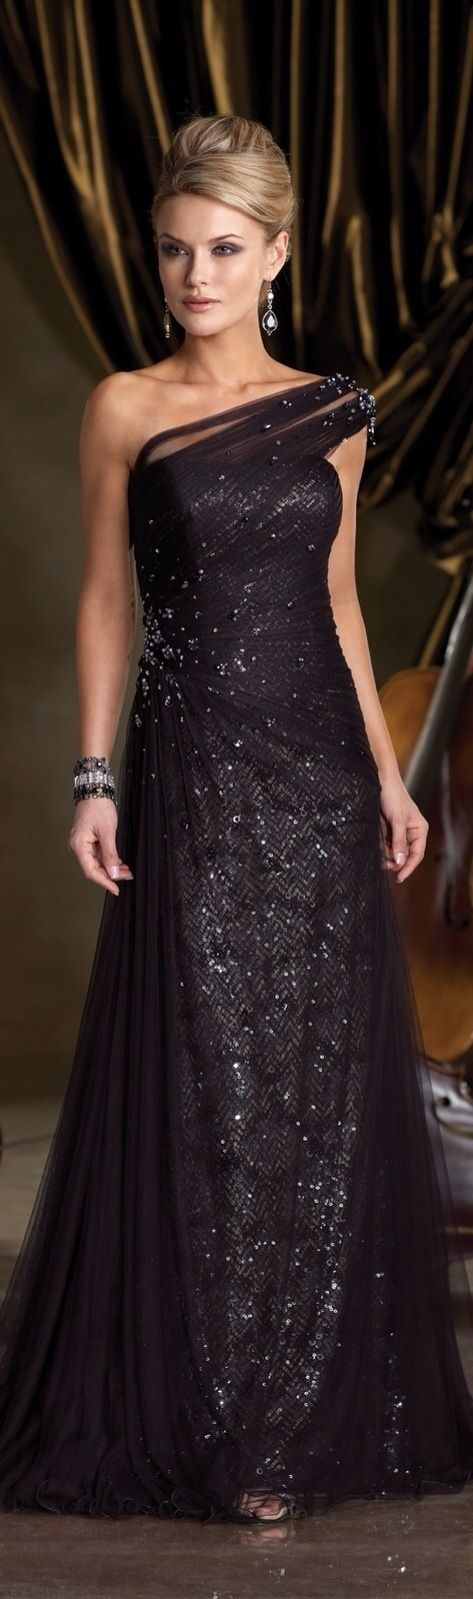 Black Sparkle Dress by ollie